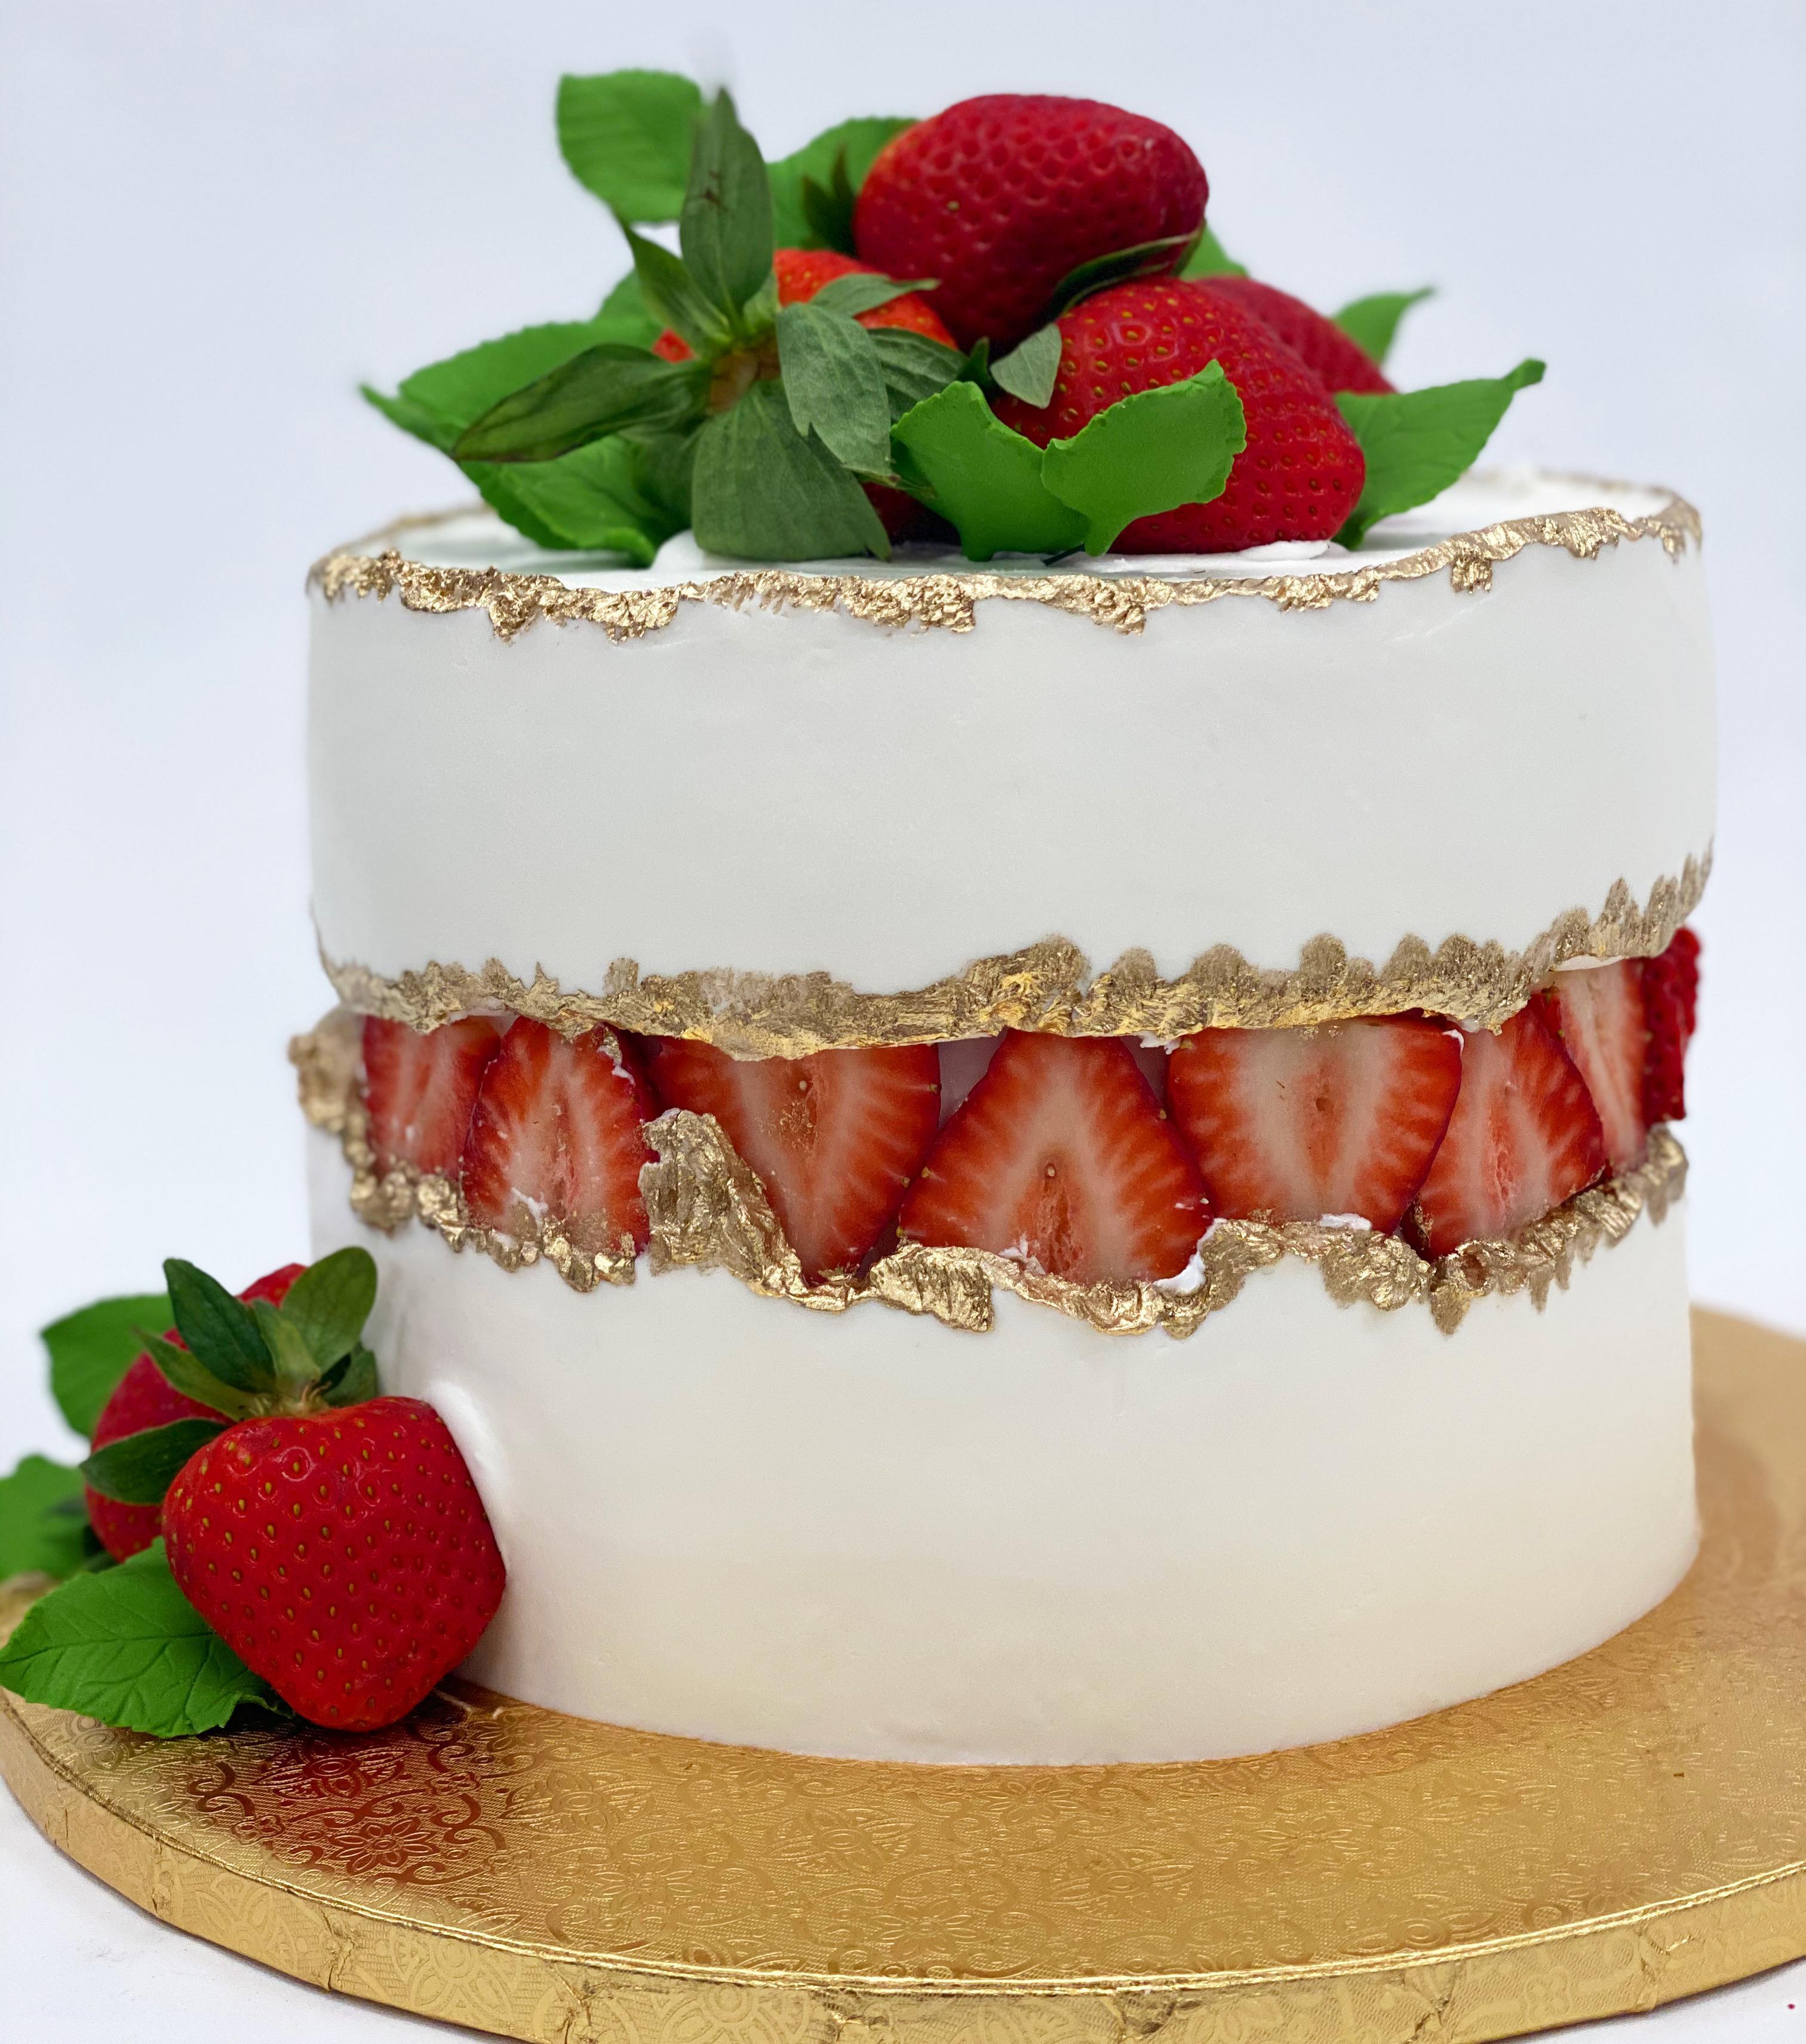 White fault line cake